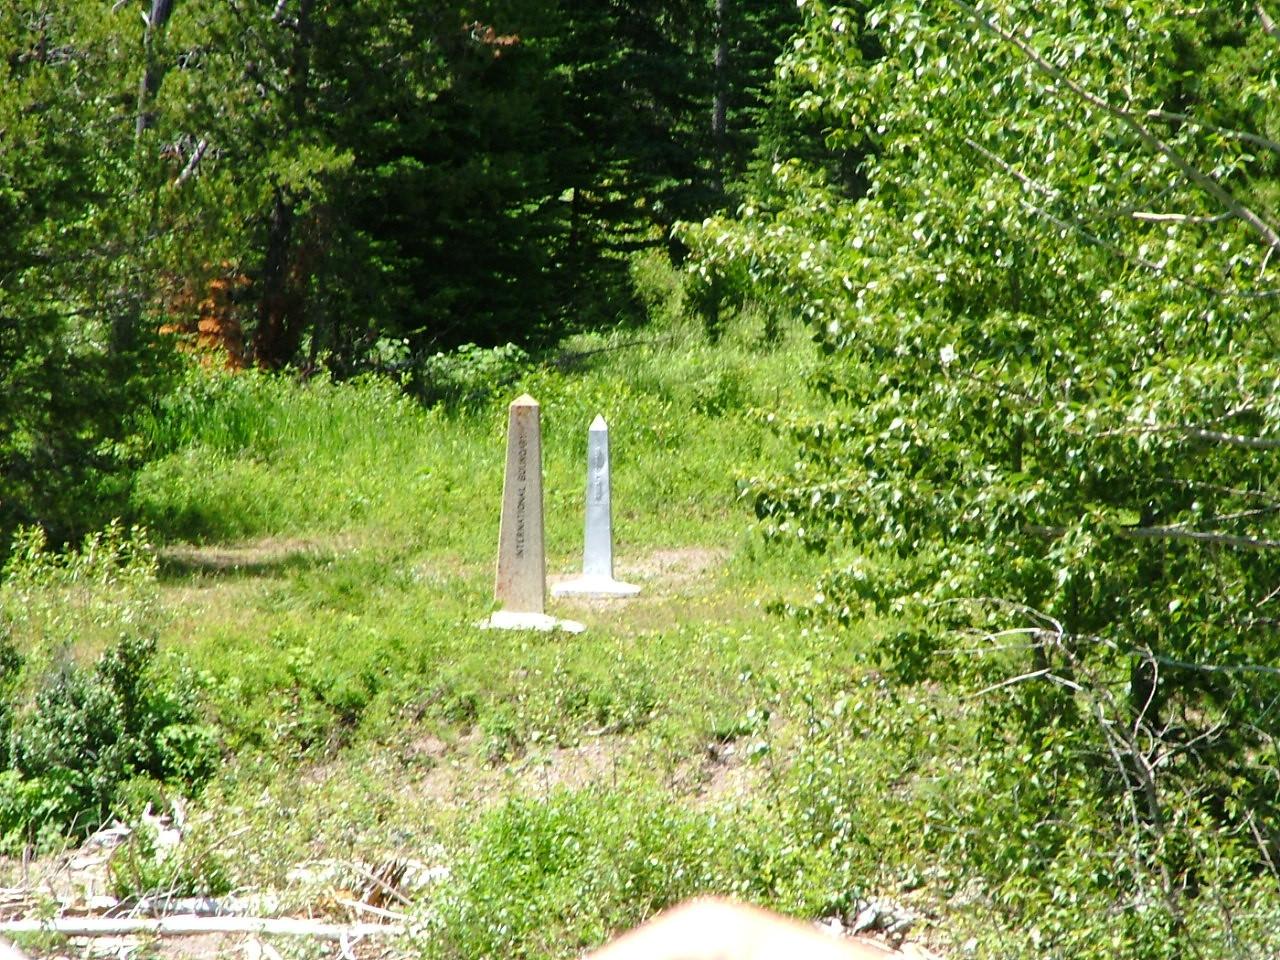 U.S./Canada border markers